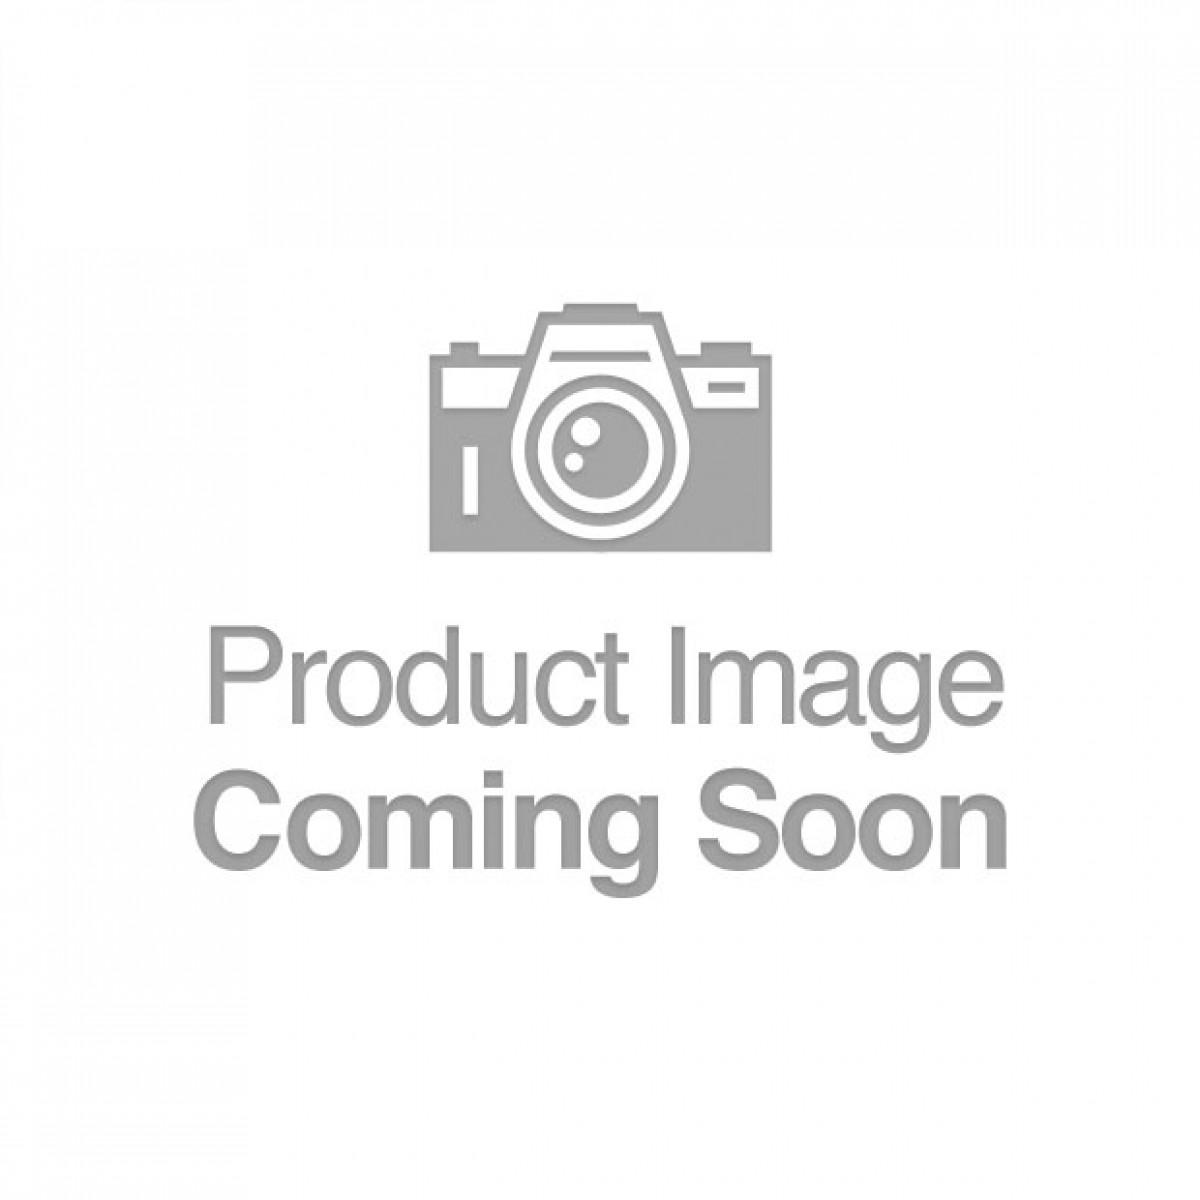 Pretty Love Webb Bunny Ears Rabbit W-handle - 12 Function Fuchsia